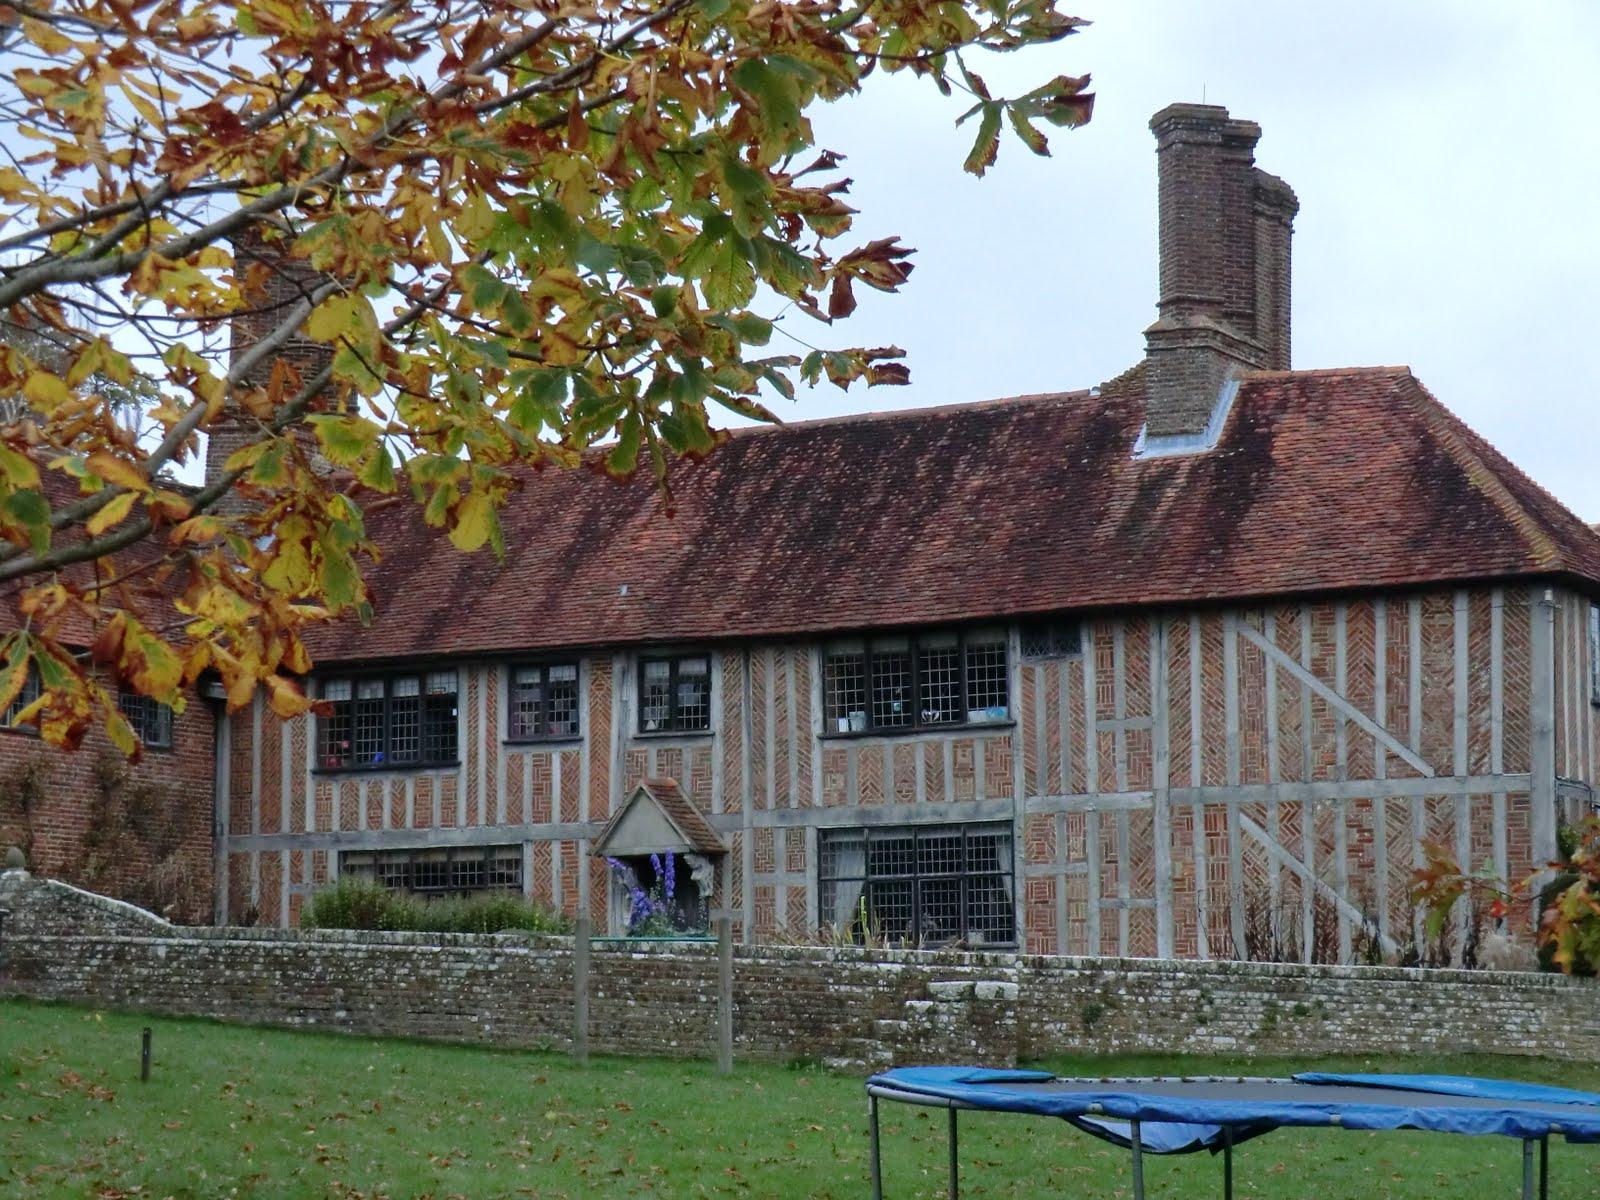 CIMG0242 Socknersh Manor